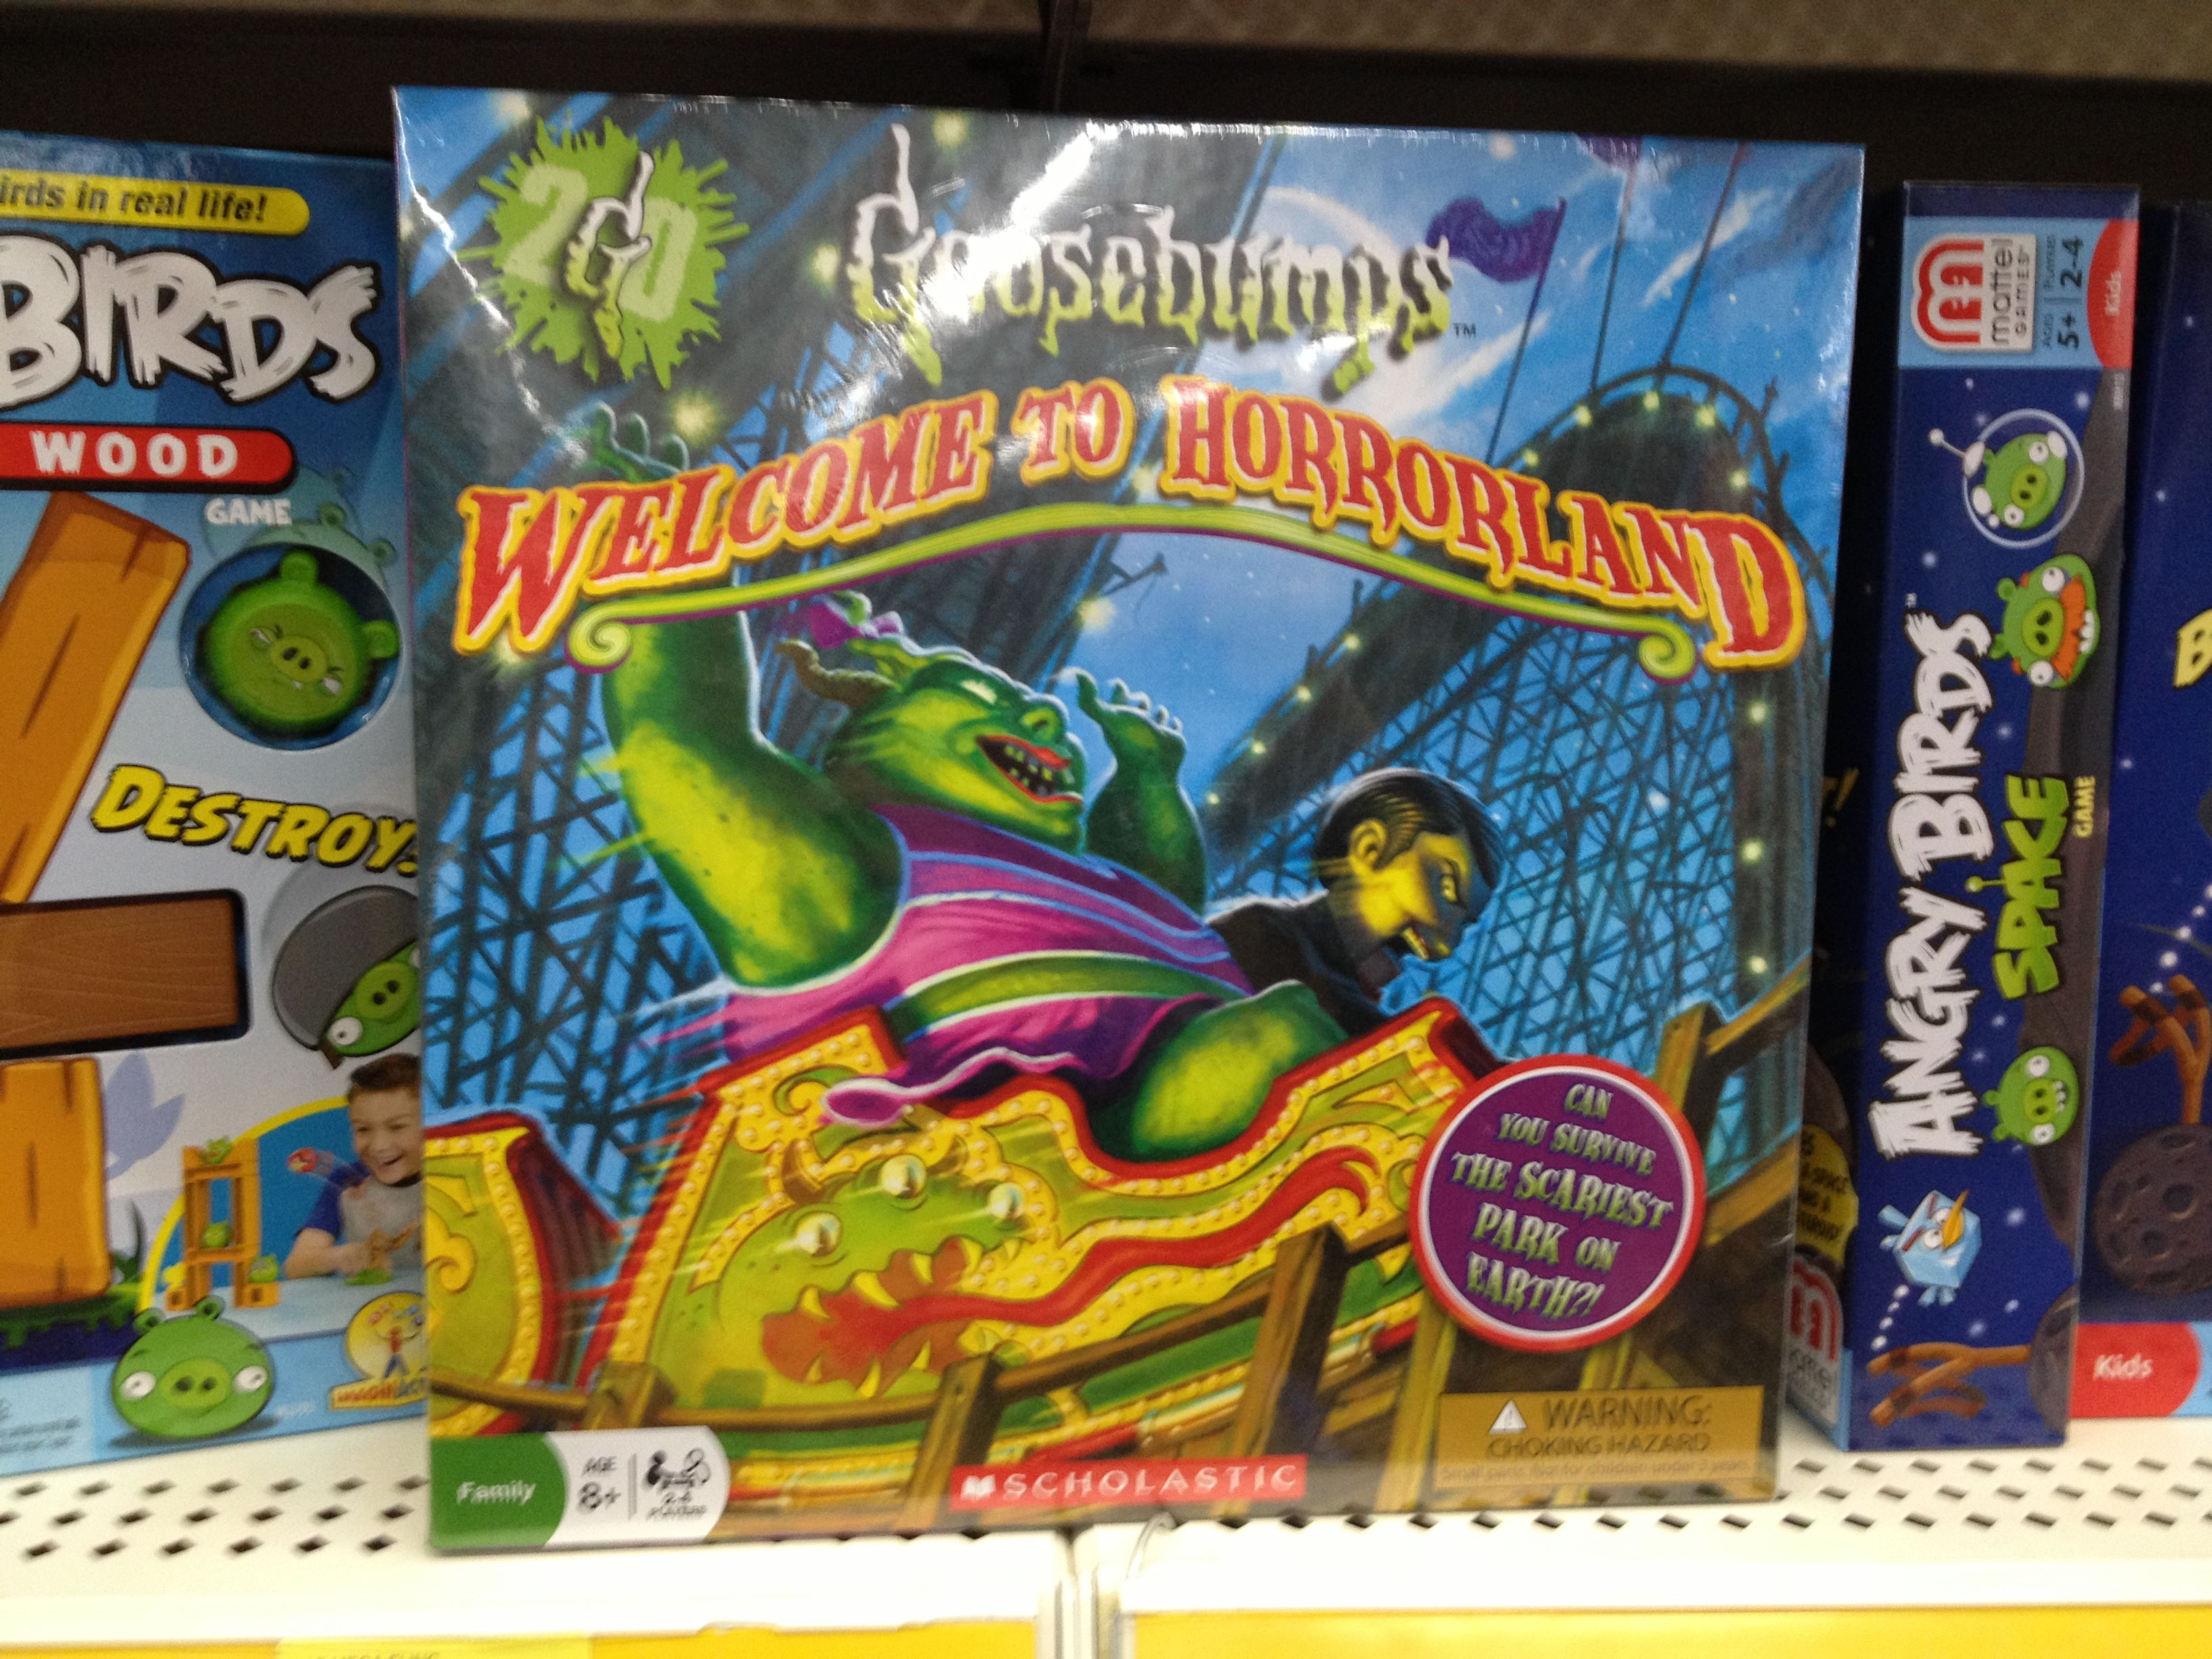 Goosebumps to Horrorland Board Game 90s kids